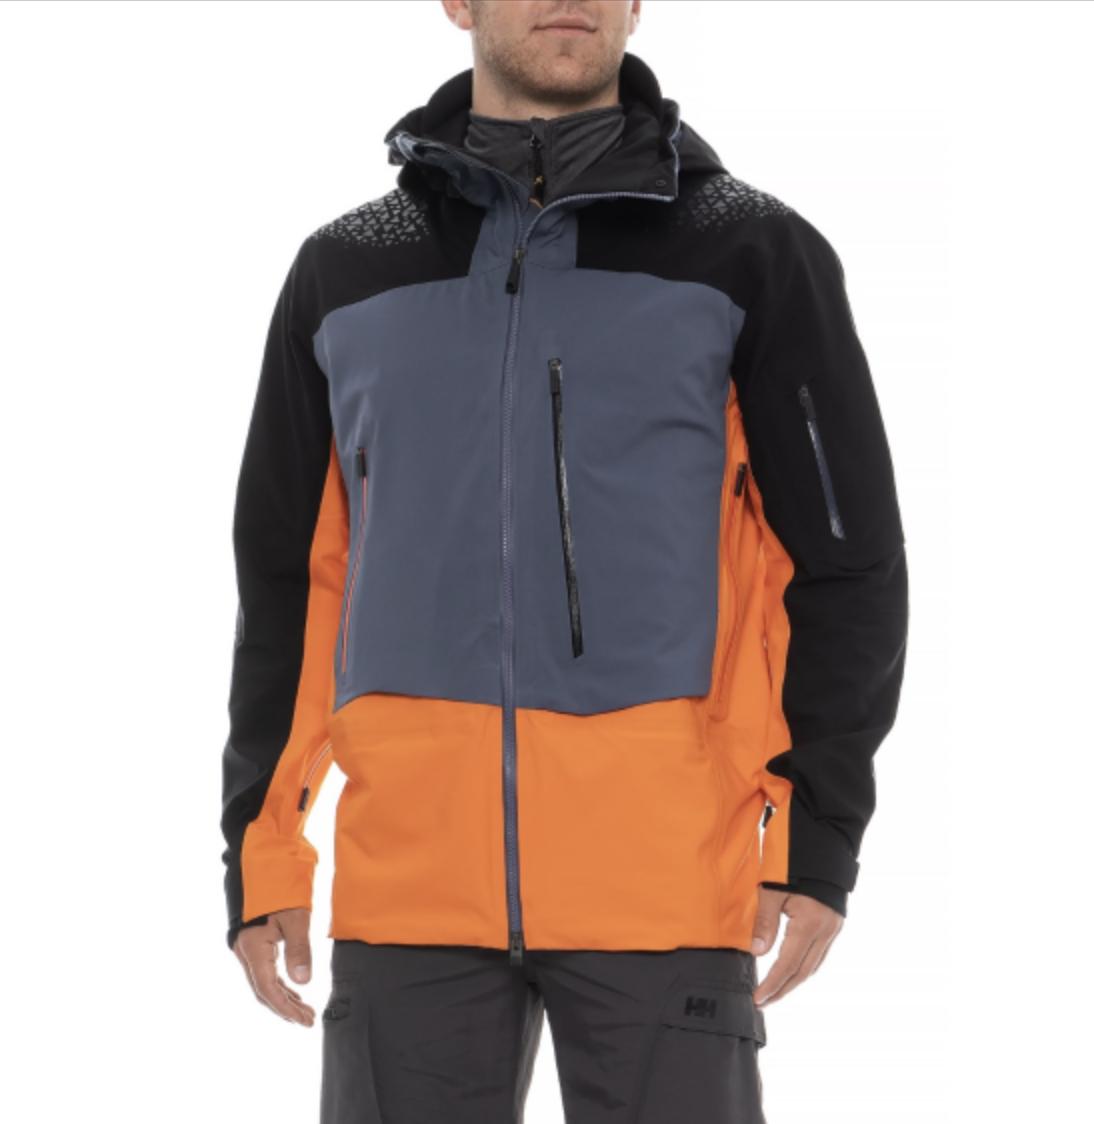 $899! NWT KJUS FRX Pro Ski Jacket Coat Dermizax Orange Black Grey Men's L EU 52